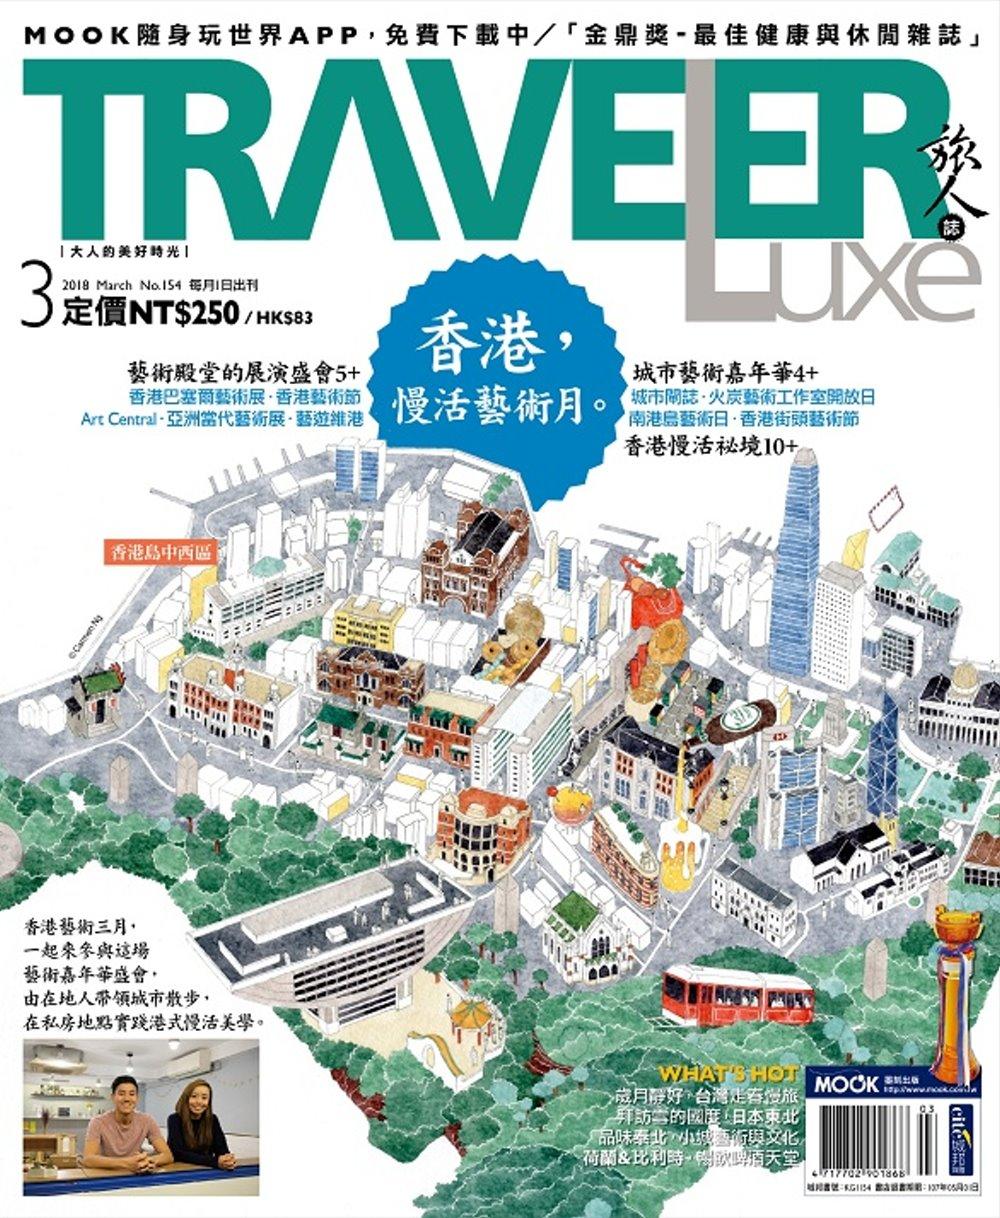 TRAVELER LUXE 旅人誌 3月號/2018 第154期